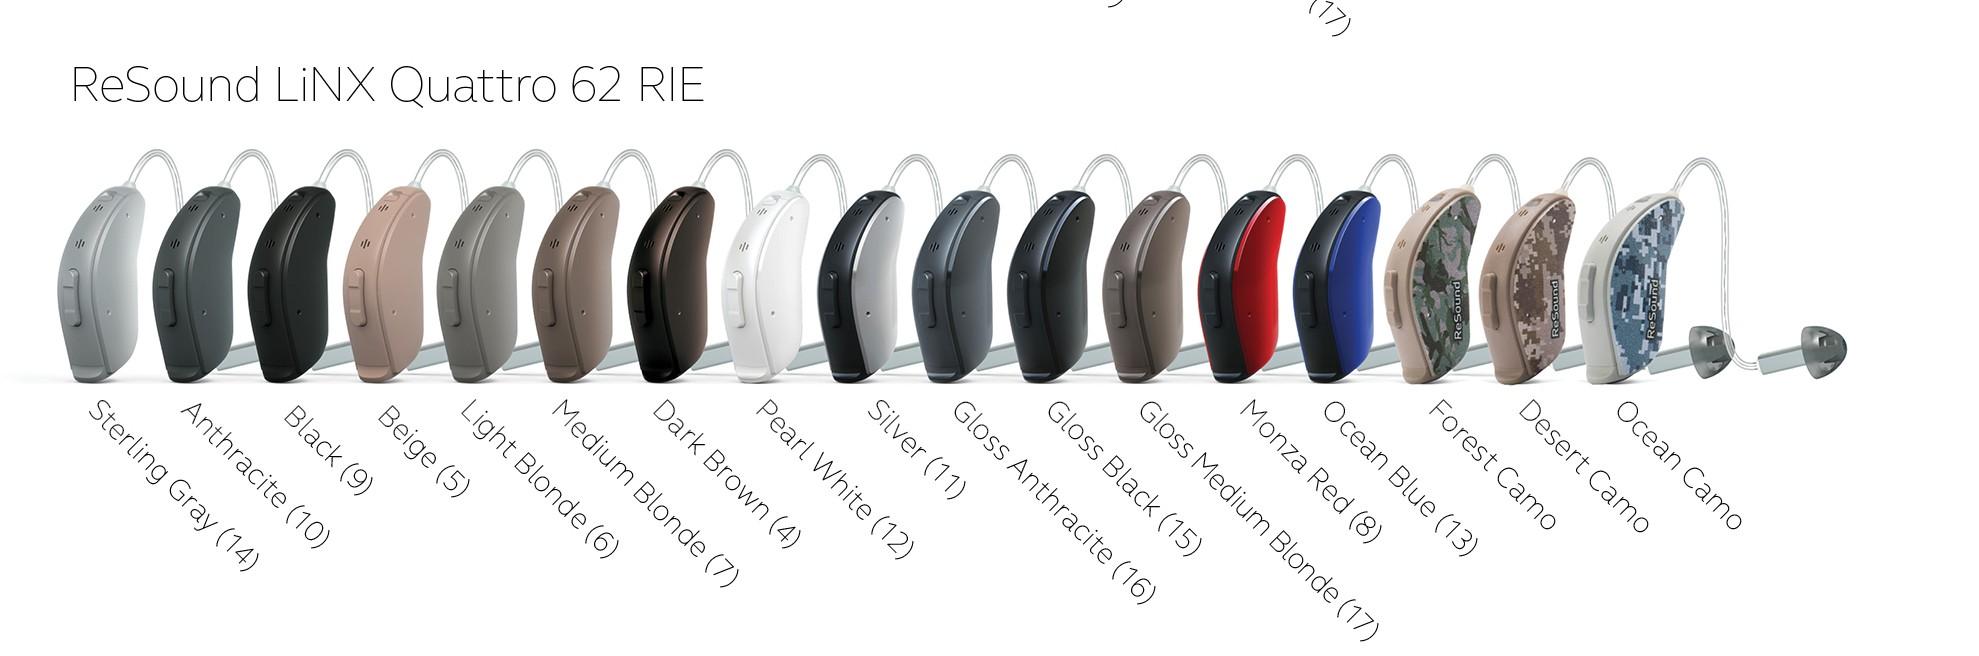 LiNX Quattro lineup02